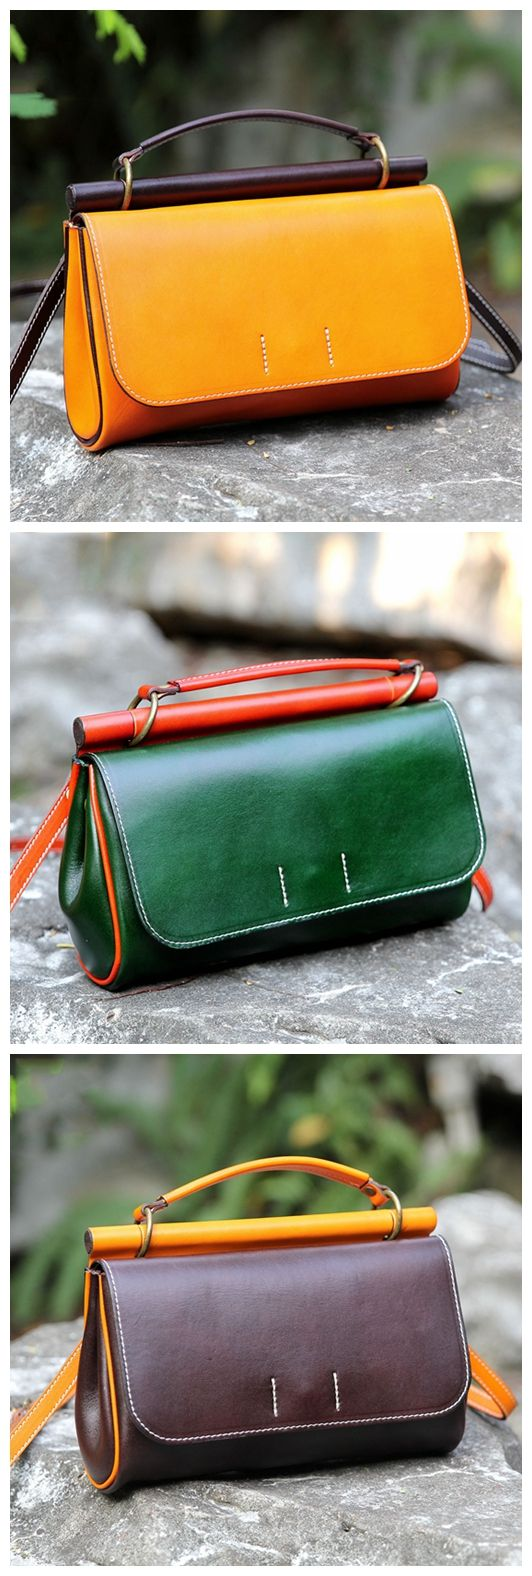 Handmade Genuine Leather Handbag Clutch Small Satchel Messenger for Women 14102Very best of Women Fashion